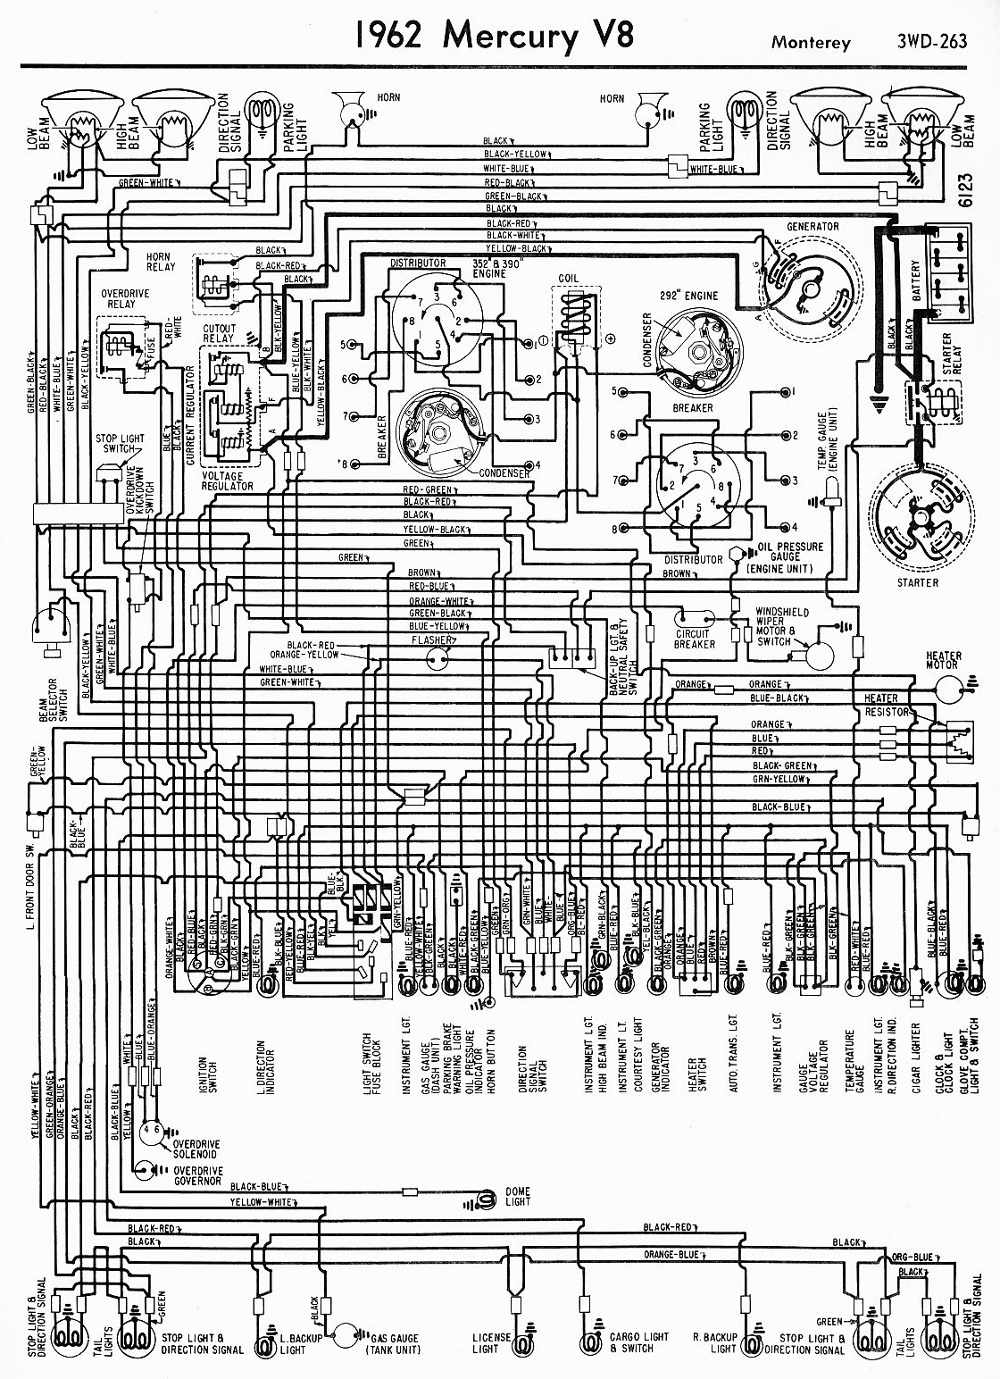 1956 mercury wiring diagram wire data schema \u2022 1965 mercury comet  wiring-diagram 1956